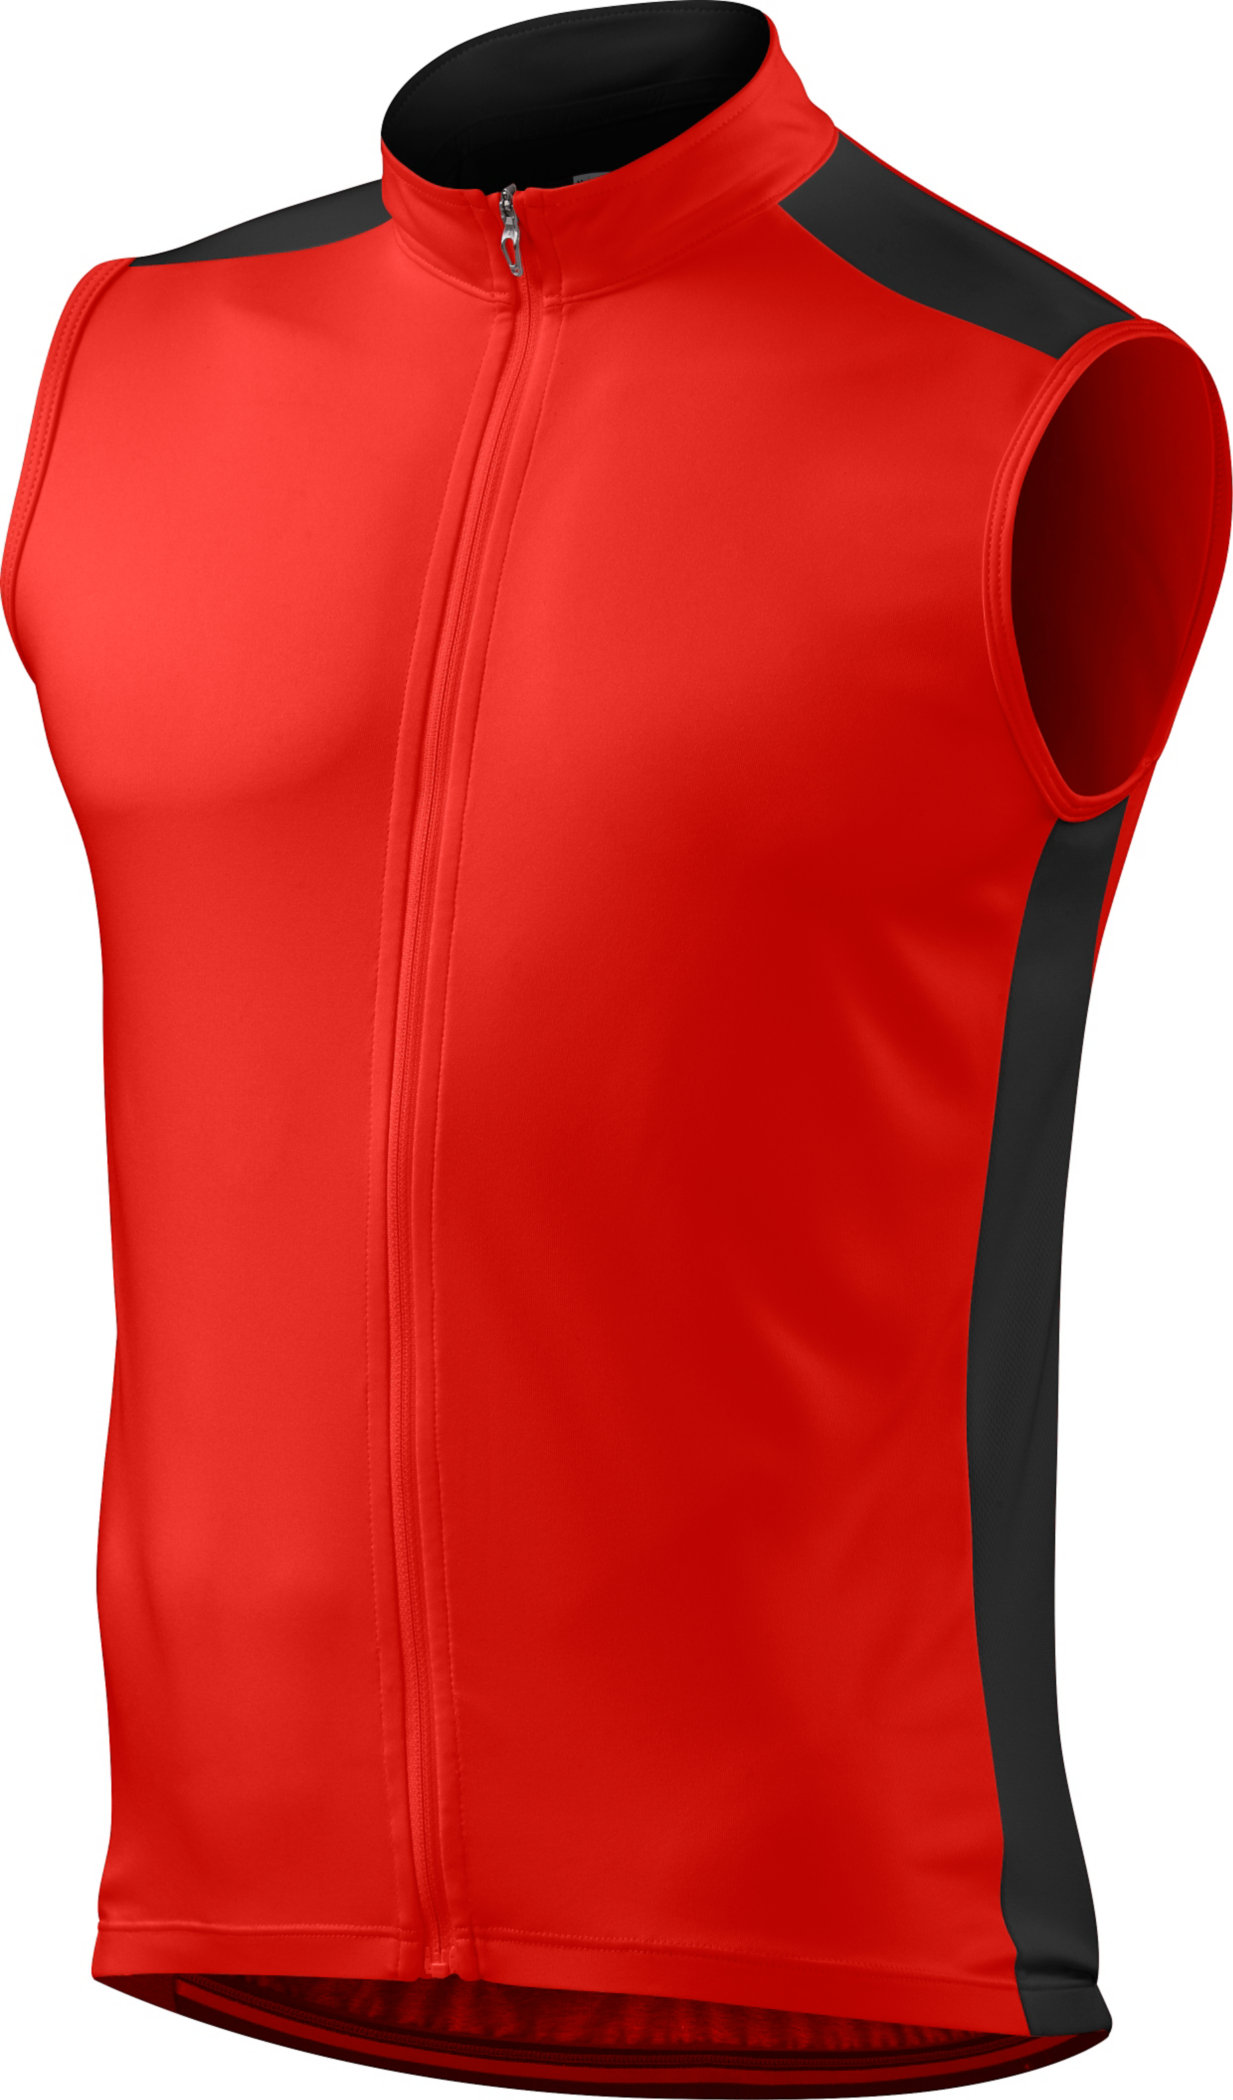 Specialized RBX Sport Sleeveless Jersey Red Medium - Alpha Bikes